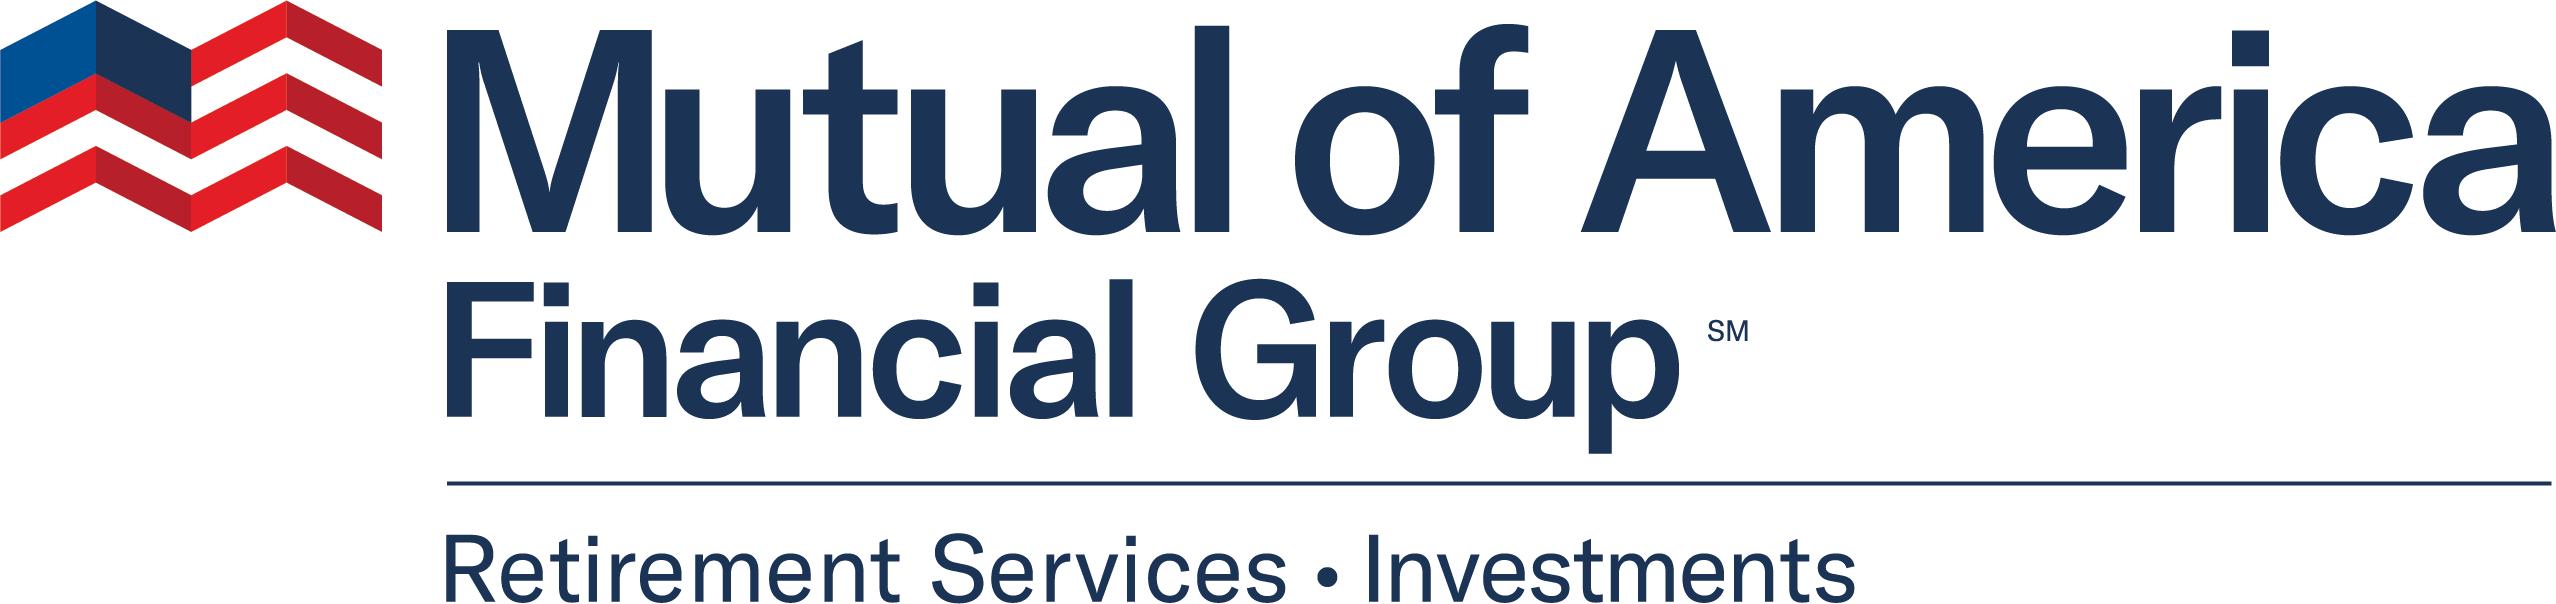 Mutual-of-America-Logo